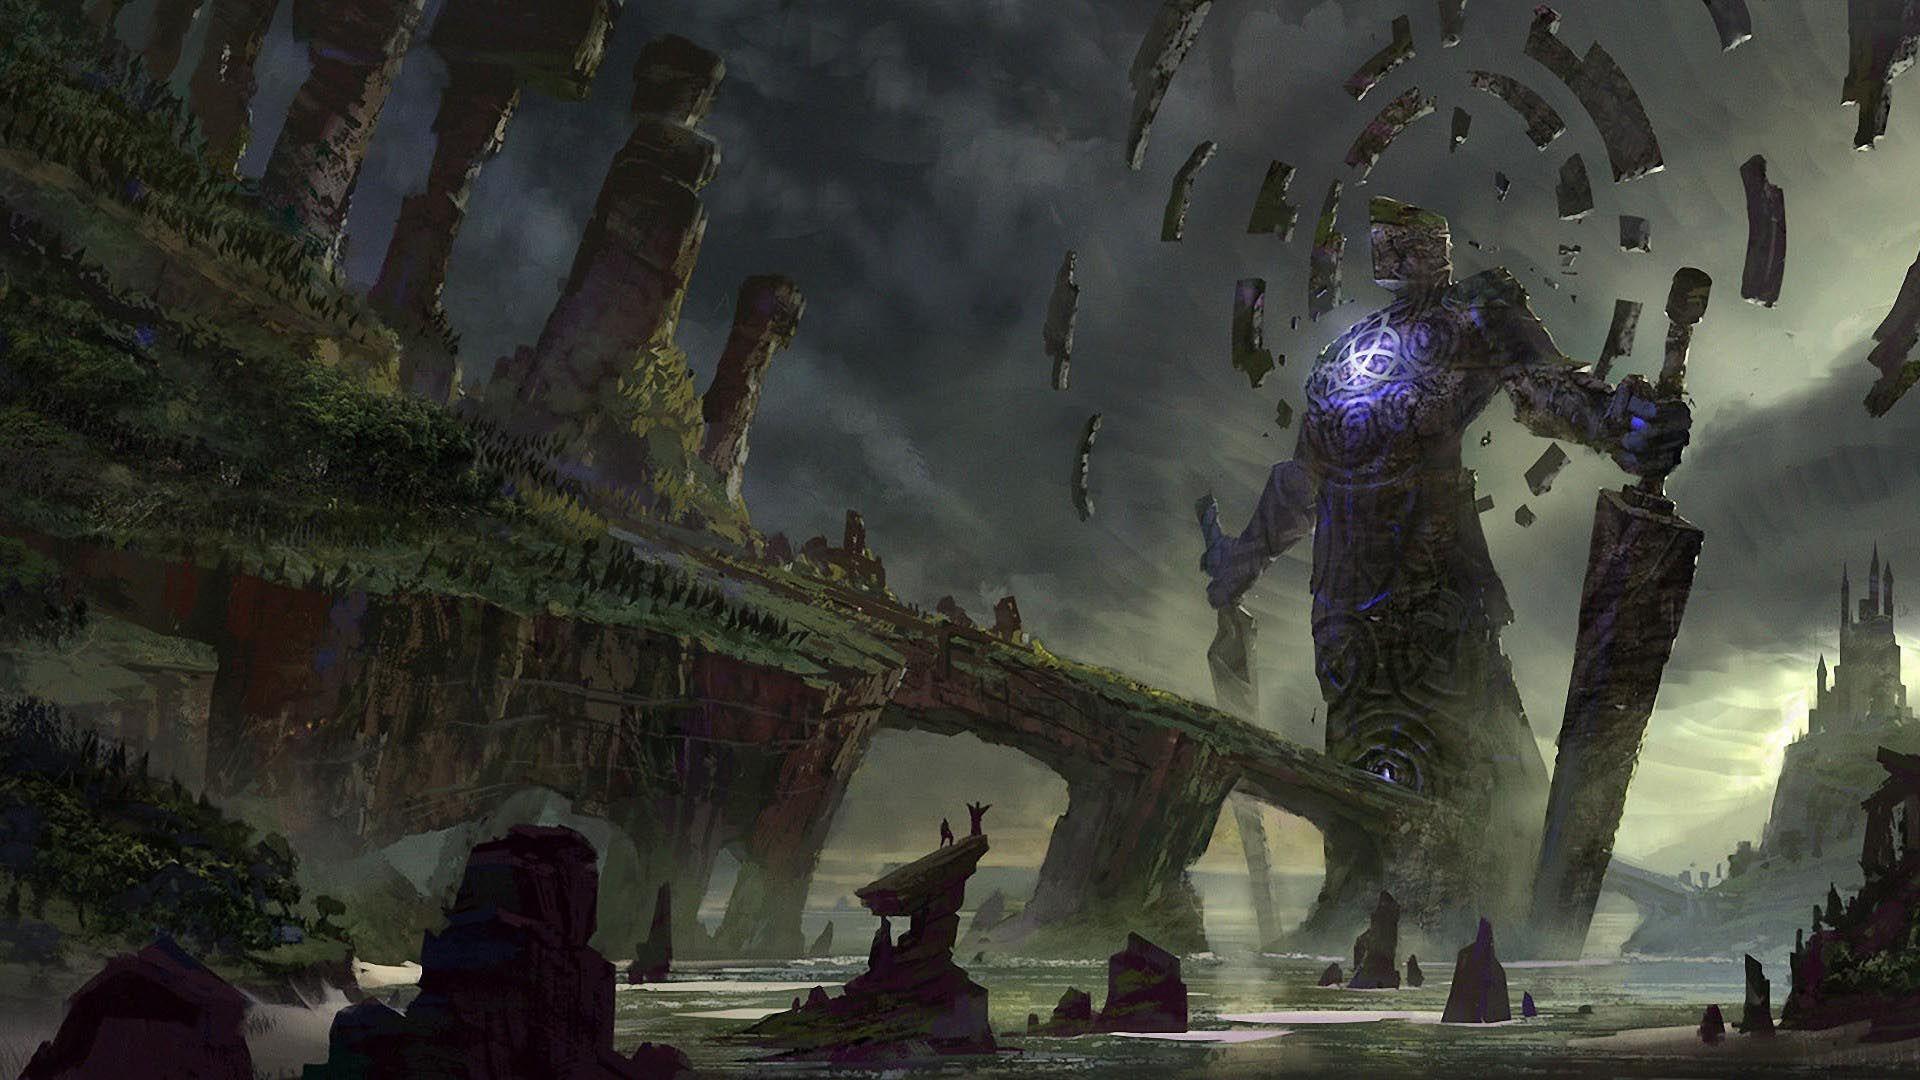 Giant Elemental Followme Cooliphone6case On Twitter Facebook Google Instagram Linkedin Blogger Tumblr Yo Art Wallpaper Fantasy Art Fantasy Landscape Fantasy giants wallpapers fantasy